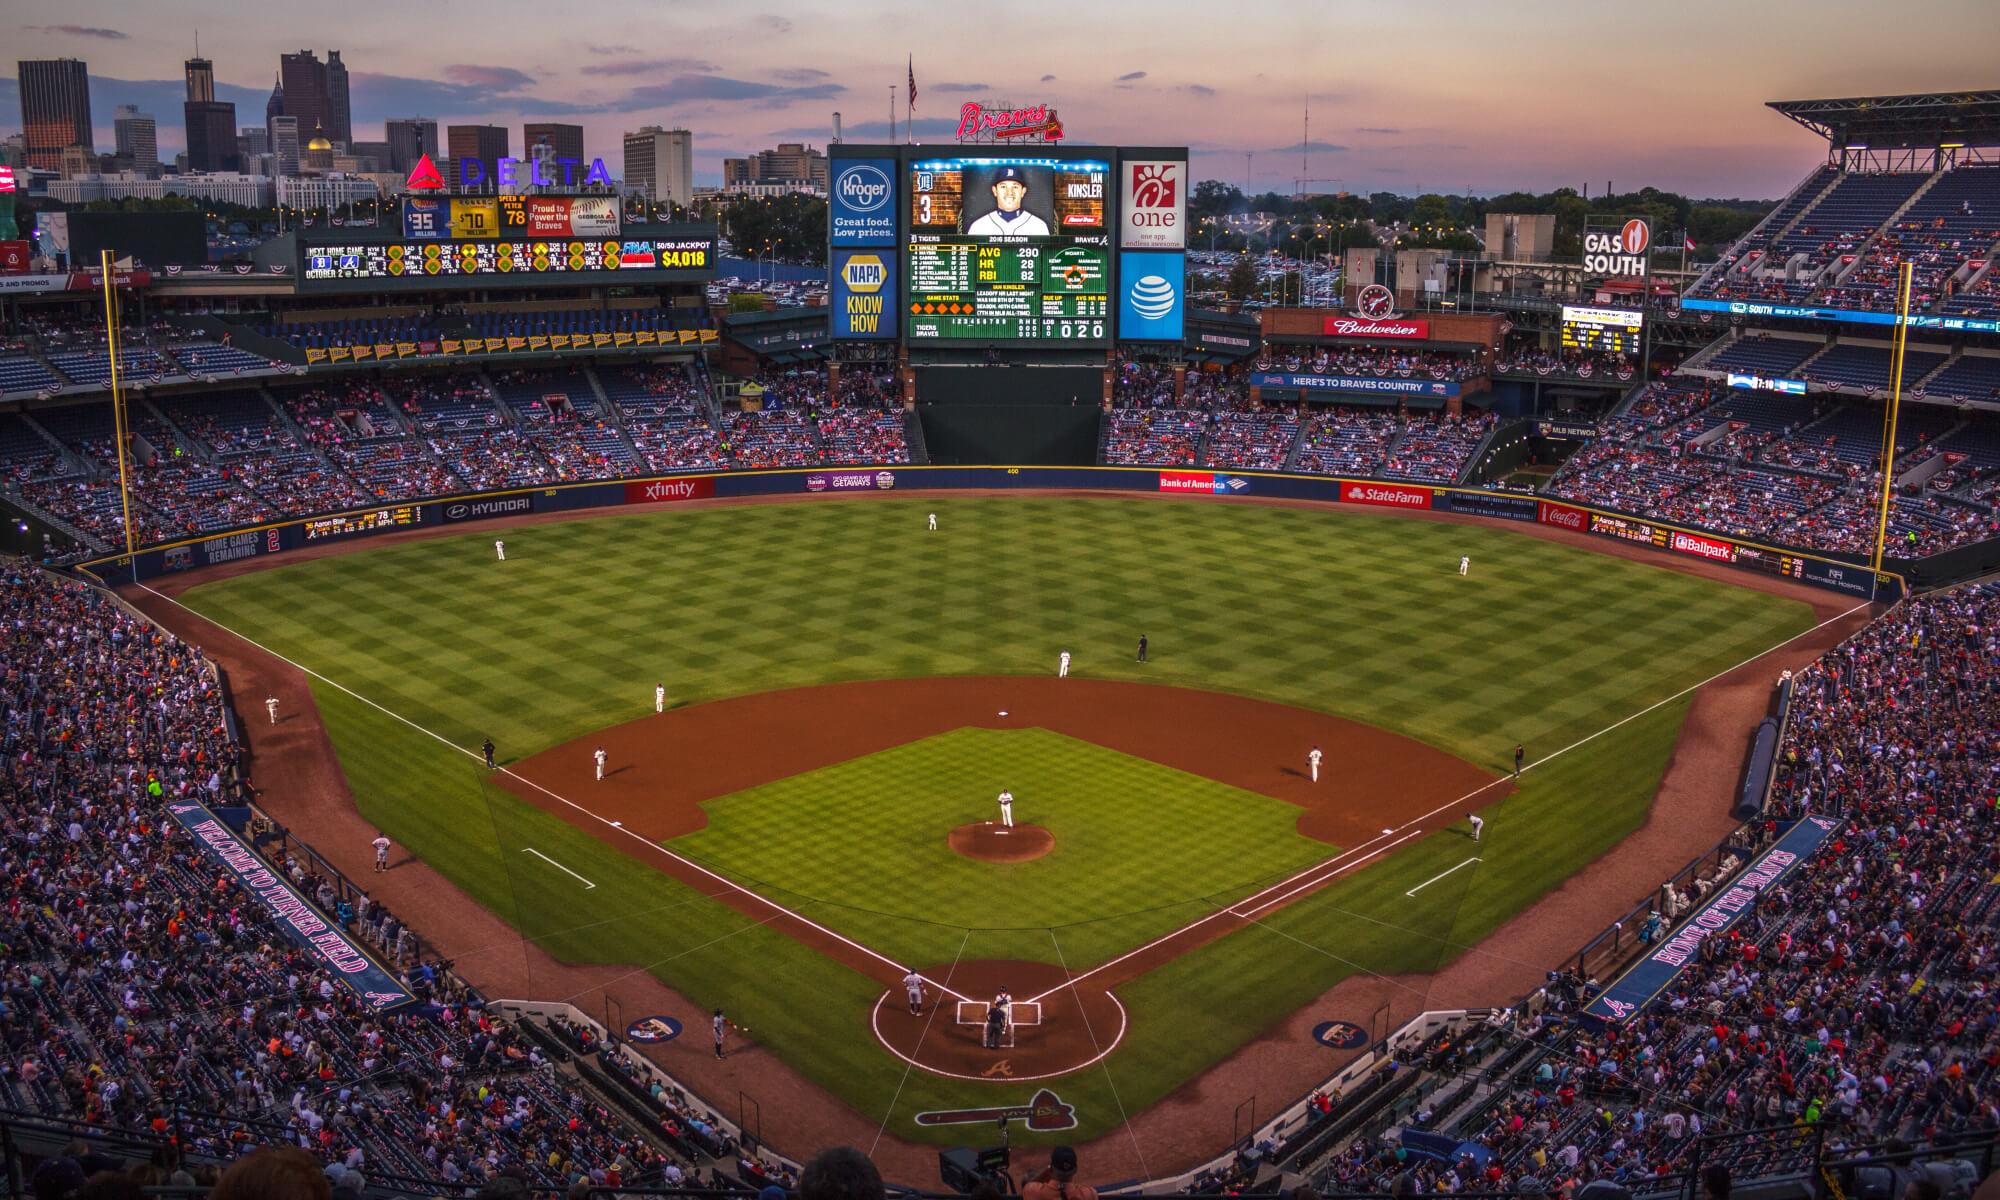 Baseball game in Atlanta, Georgia